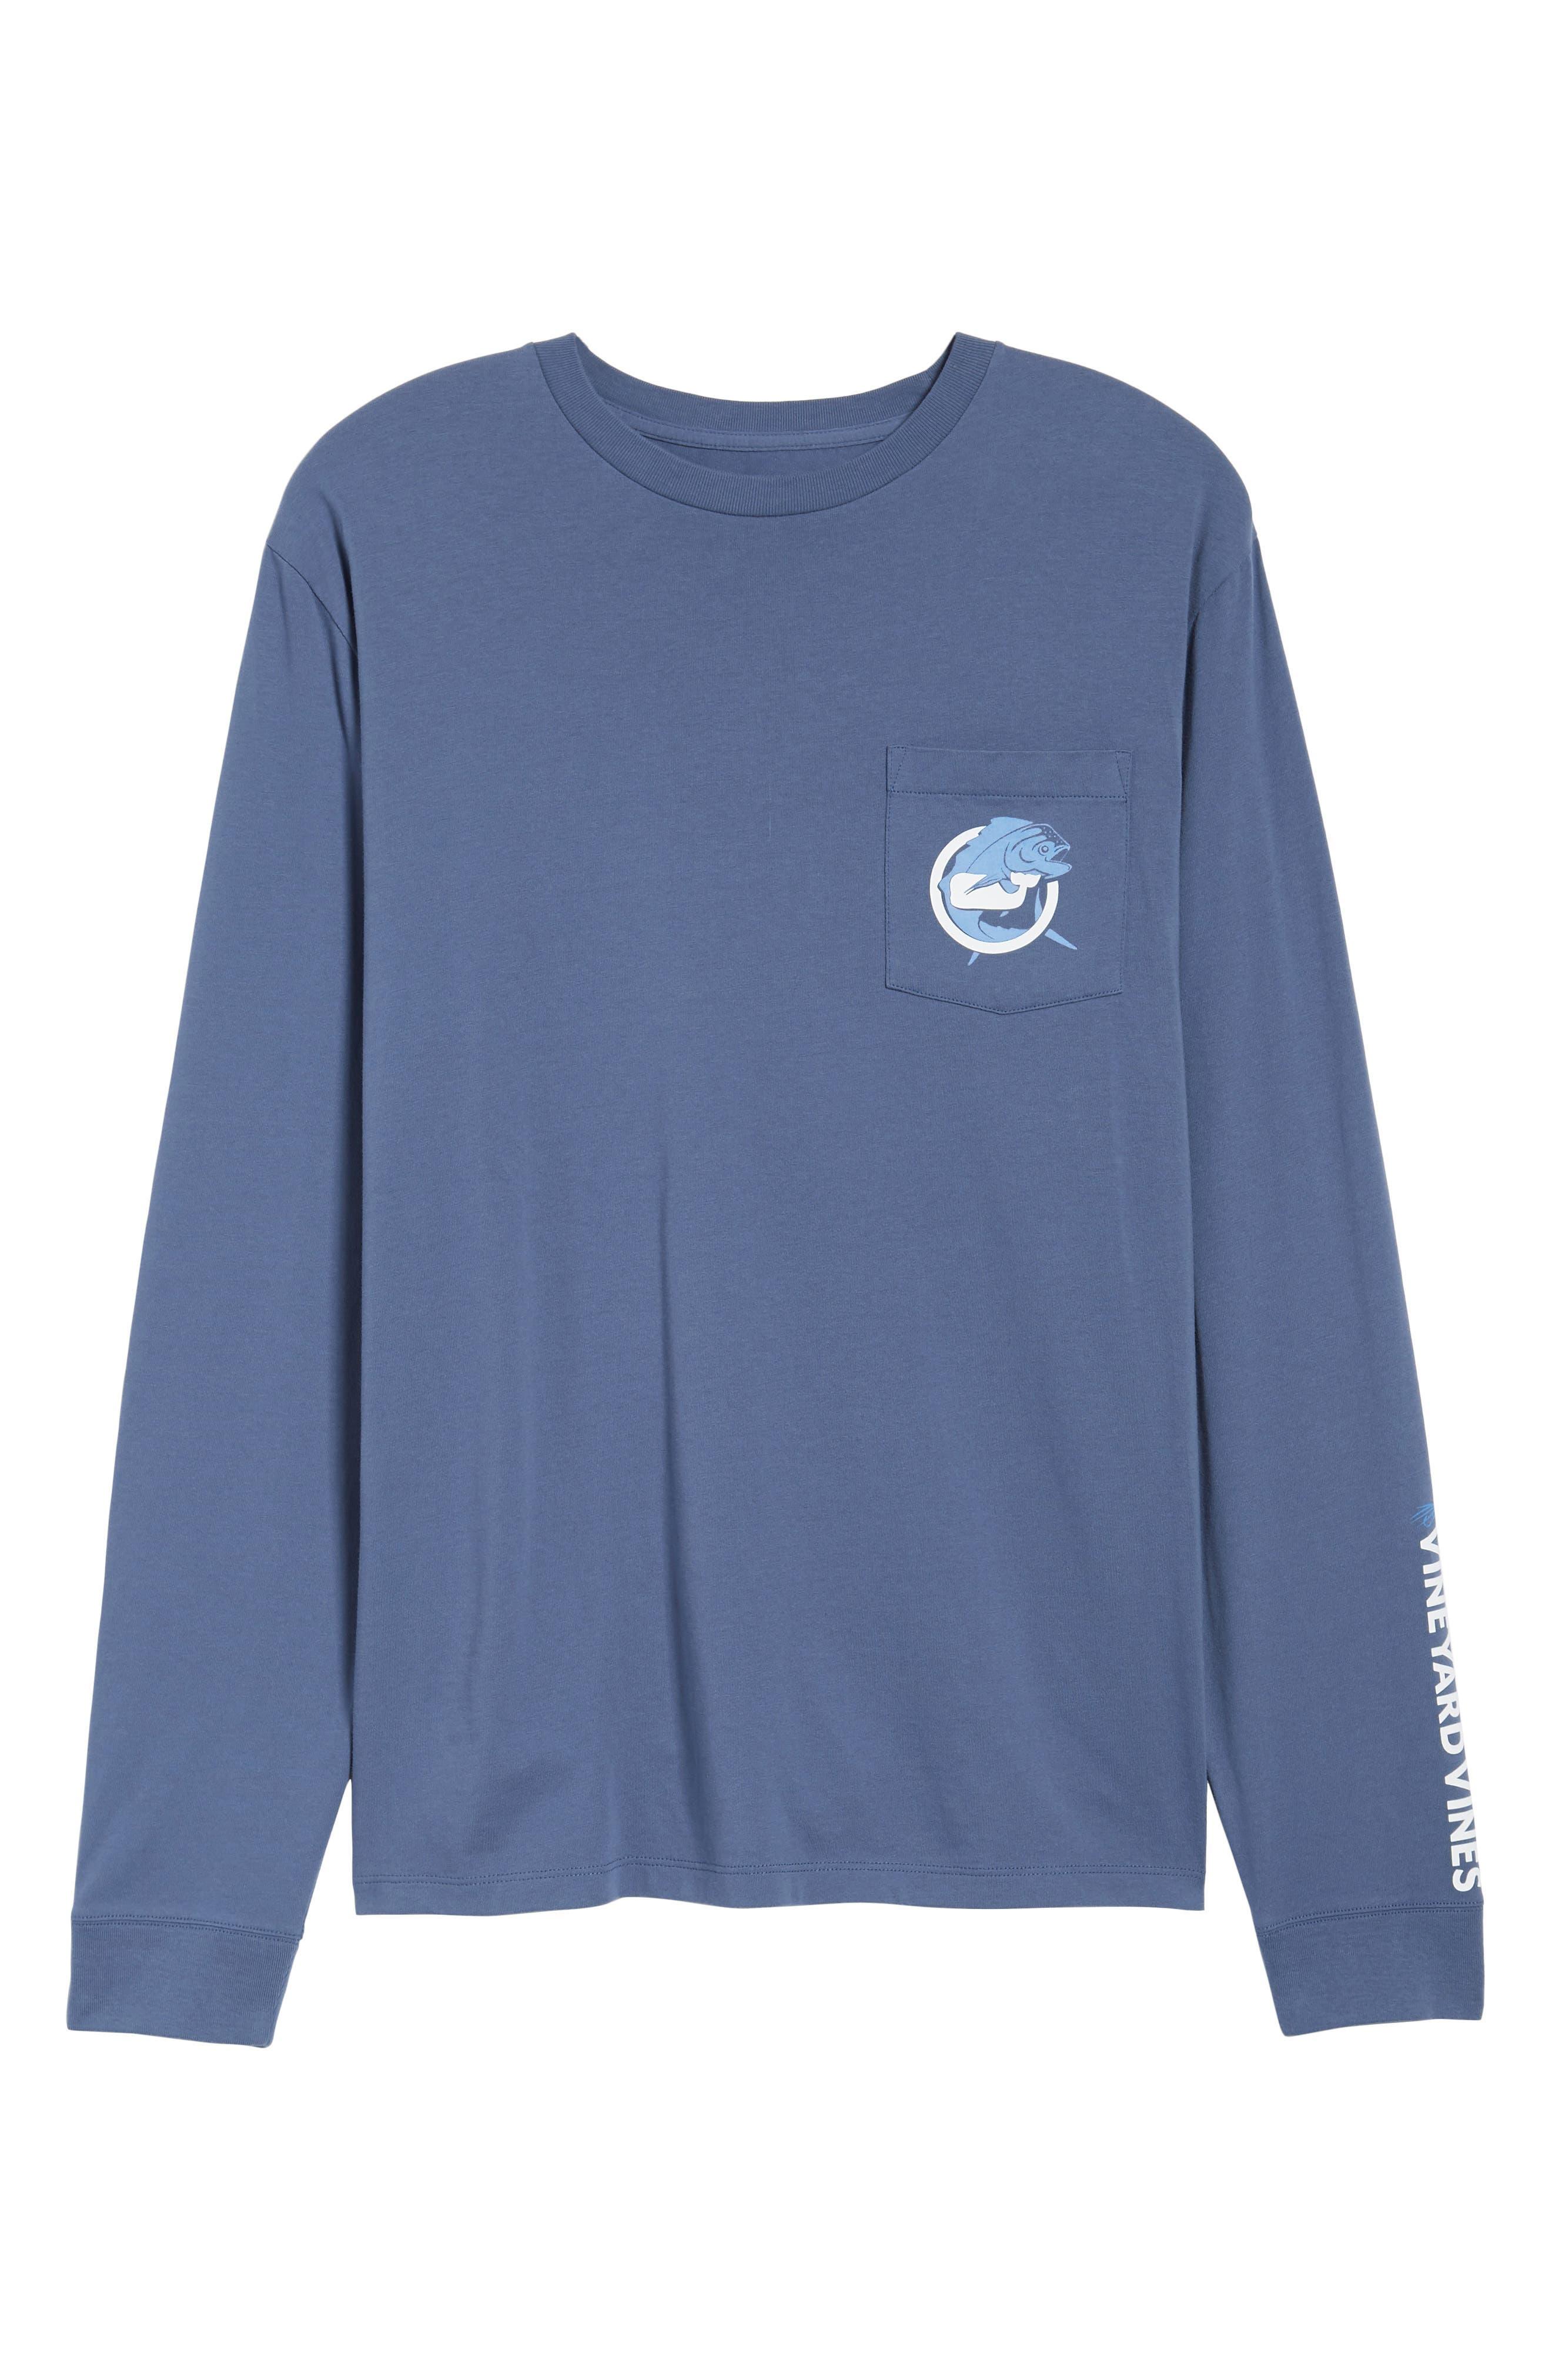 Mahi Long Sleeve T-Shirt,                             Alternate thumbnail 6, color,                             461